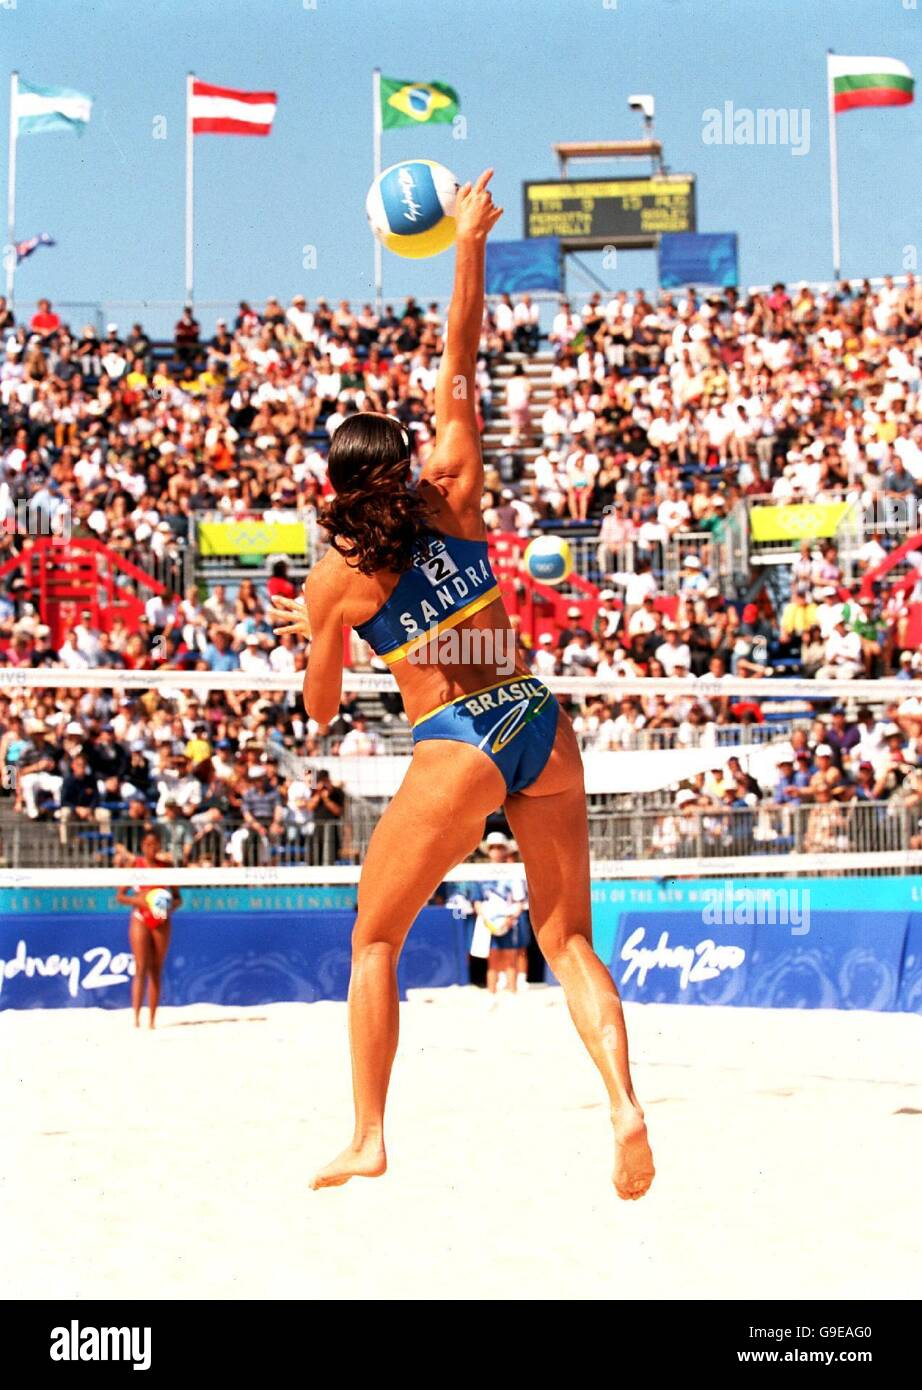 Women S Beach Volleyball Sydney 2000 Olympics Cuba V Brazil Stock Photo Alamy